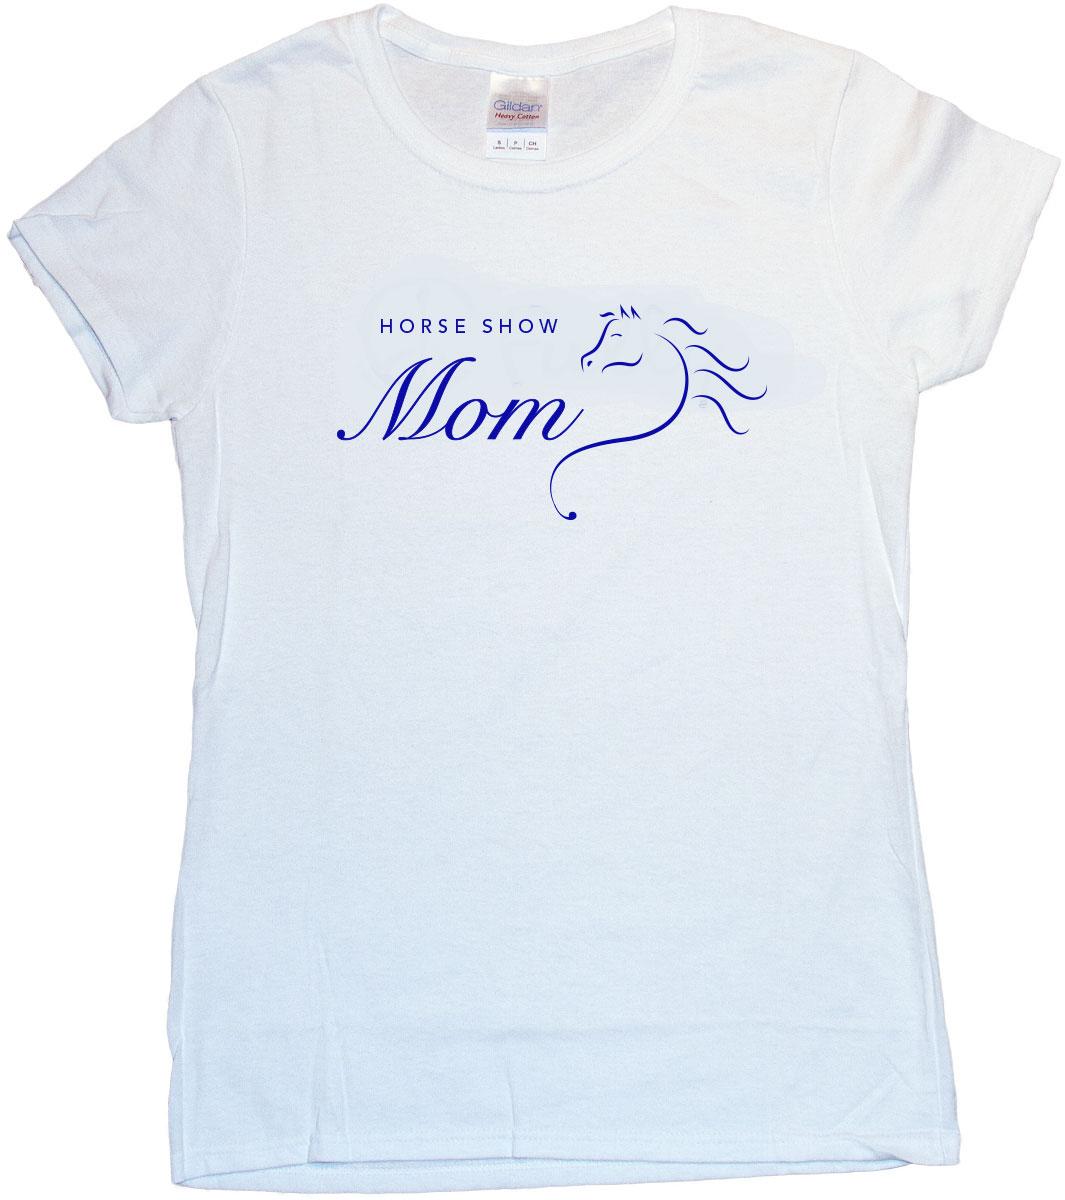 T Shirt Horse Design   Horse Show Mom Tshirt Indigraphics Design